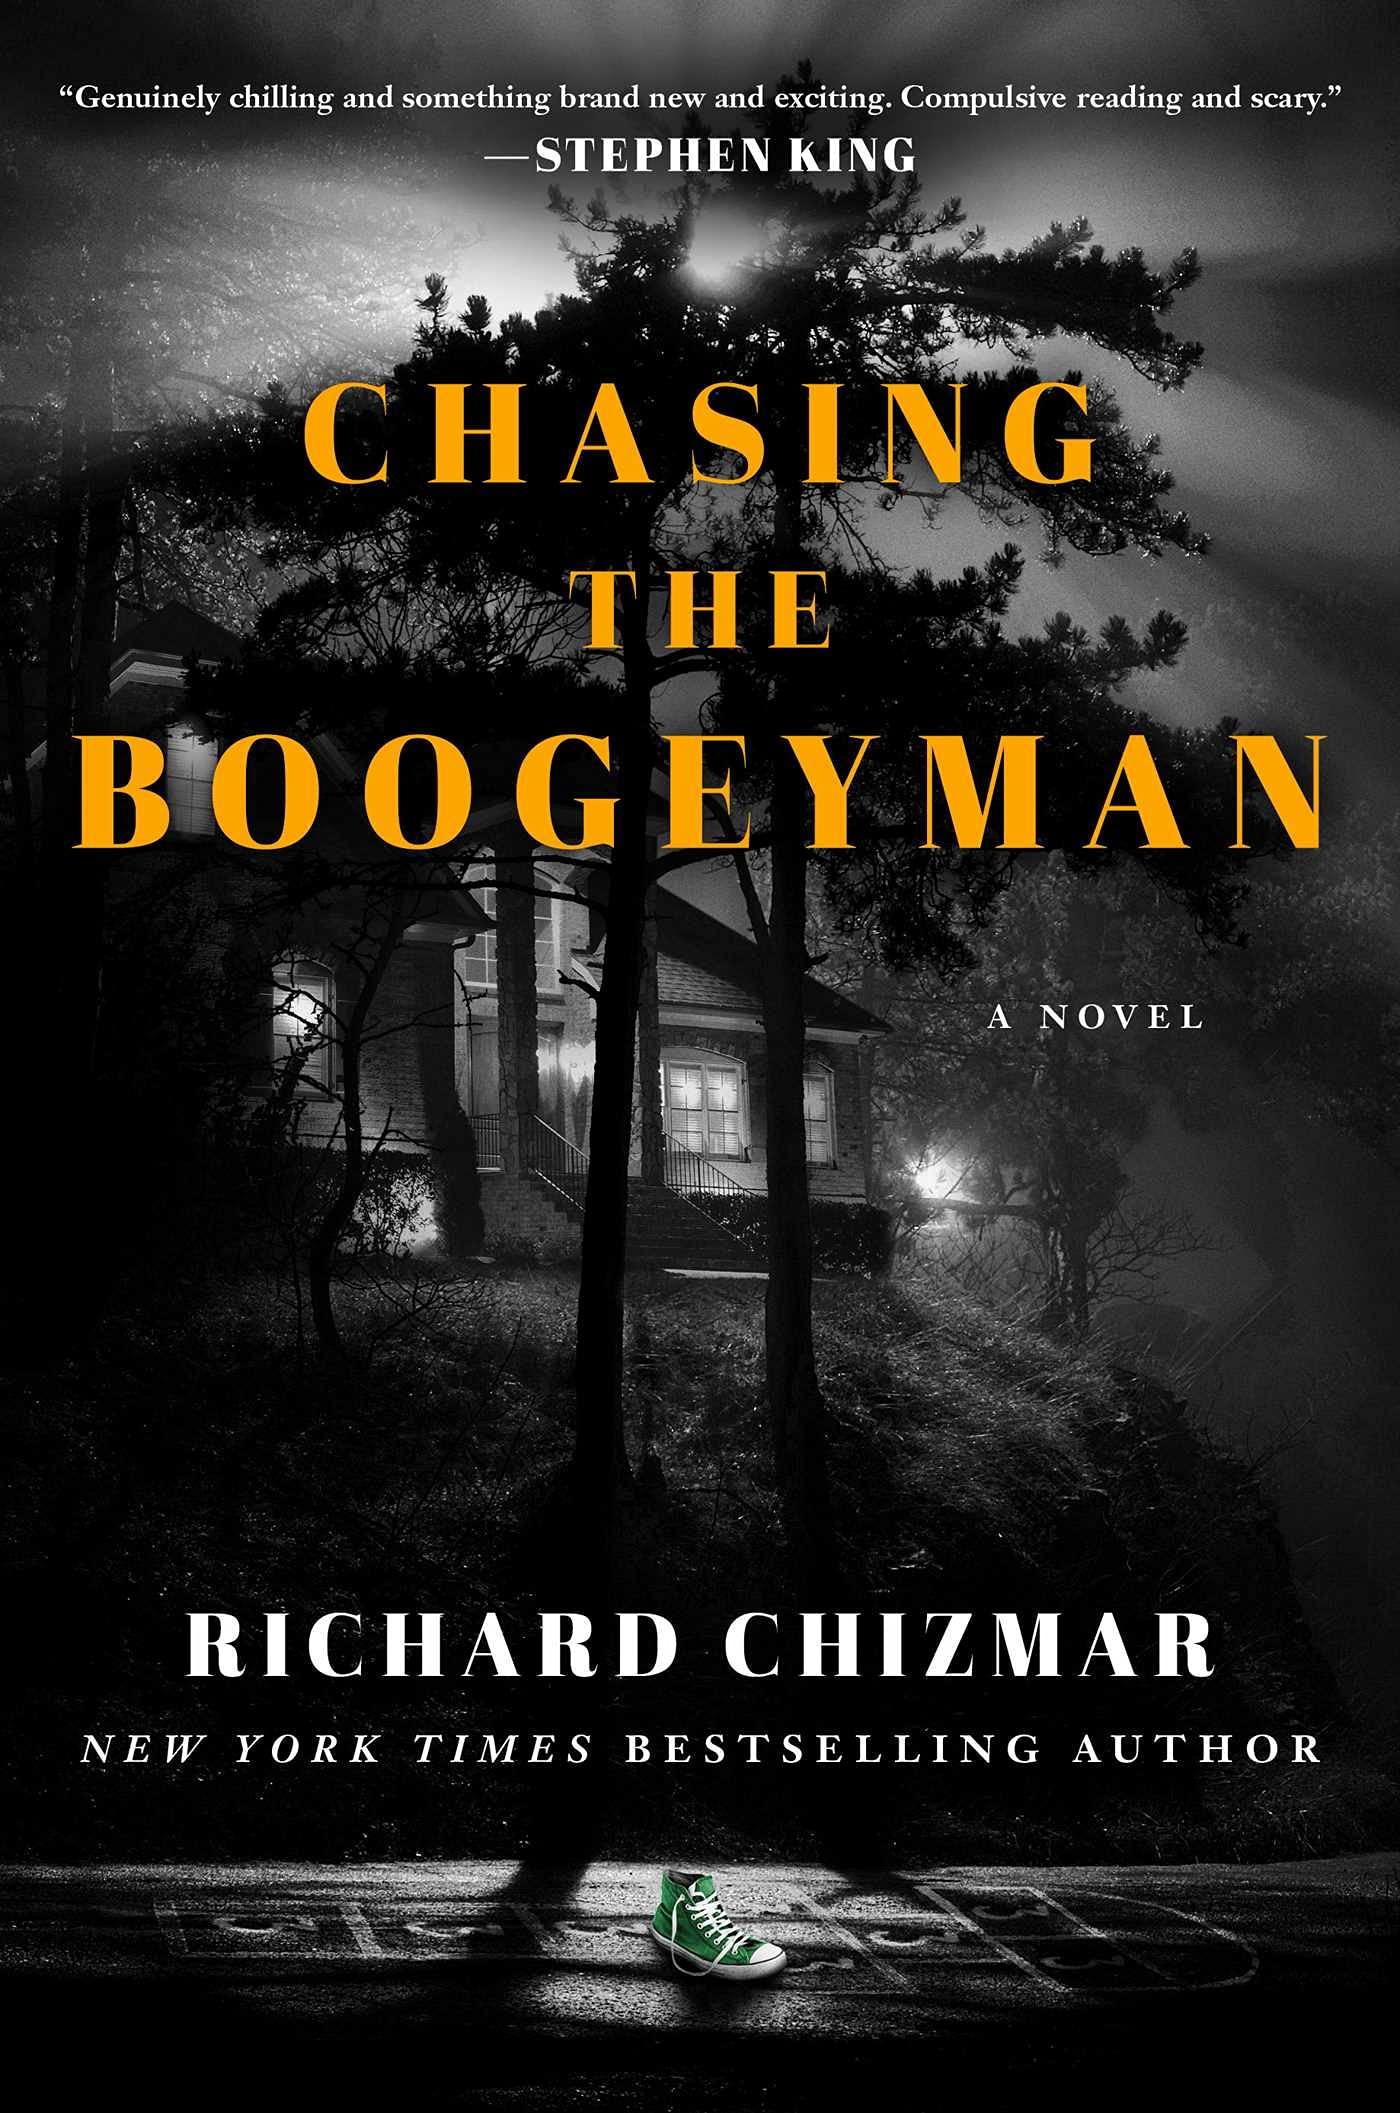 Chasingtheboogeyman_small